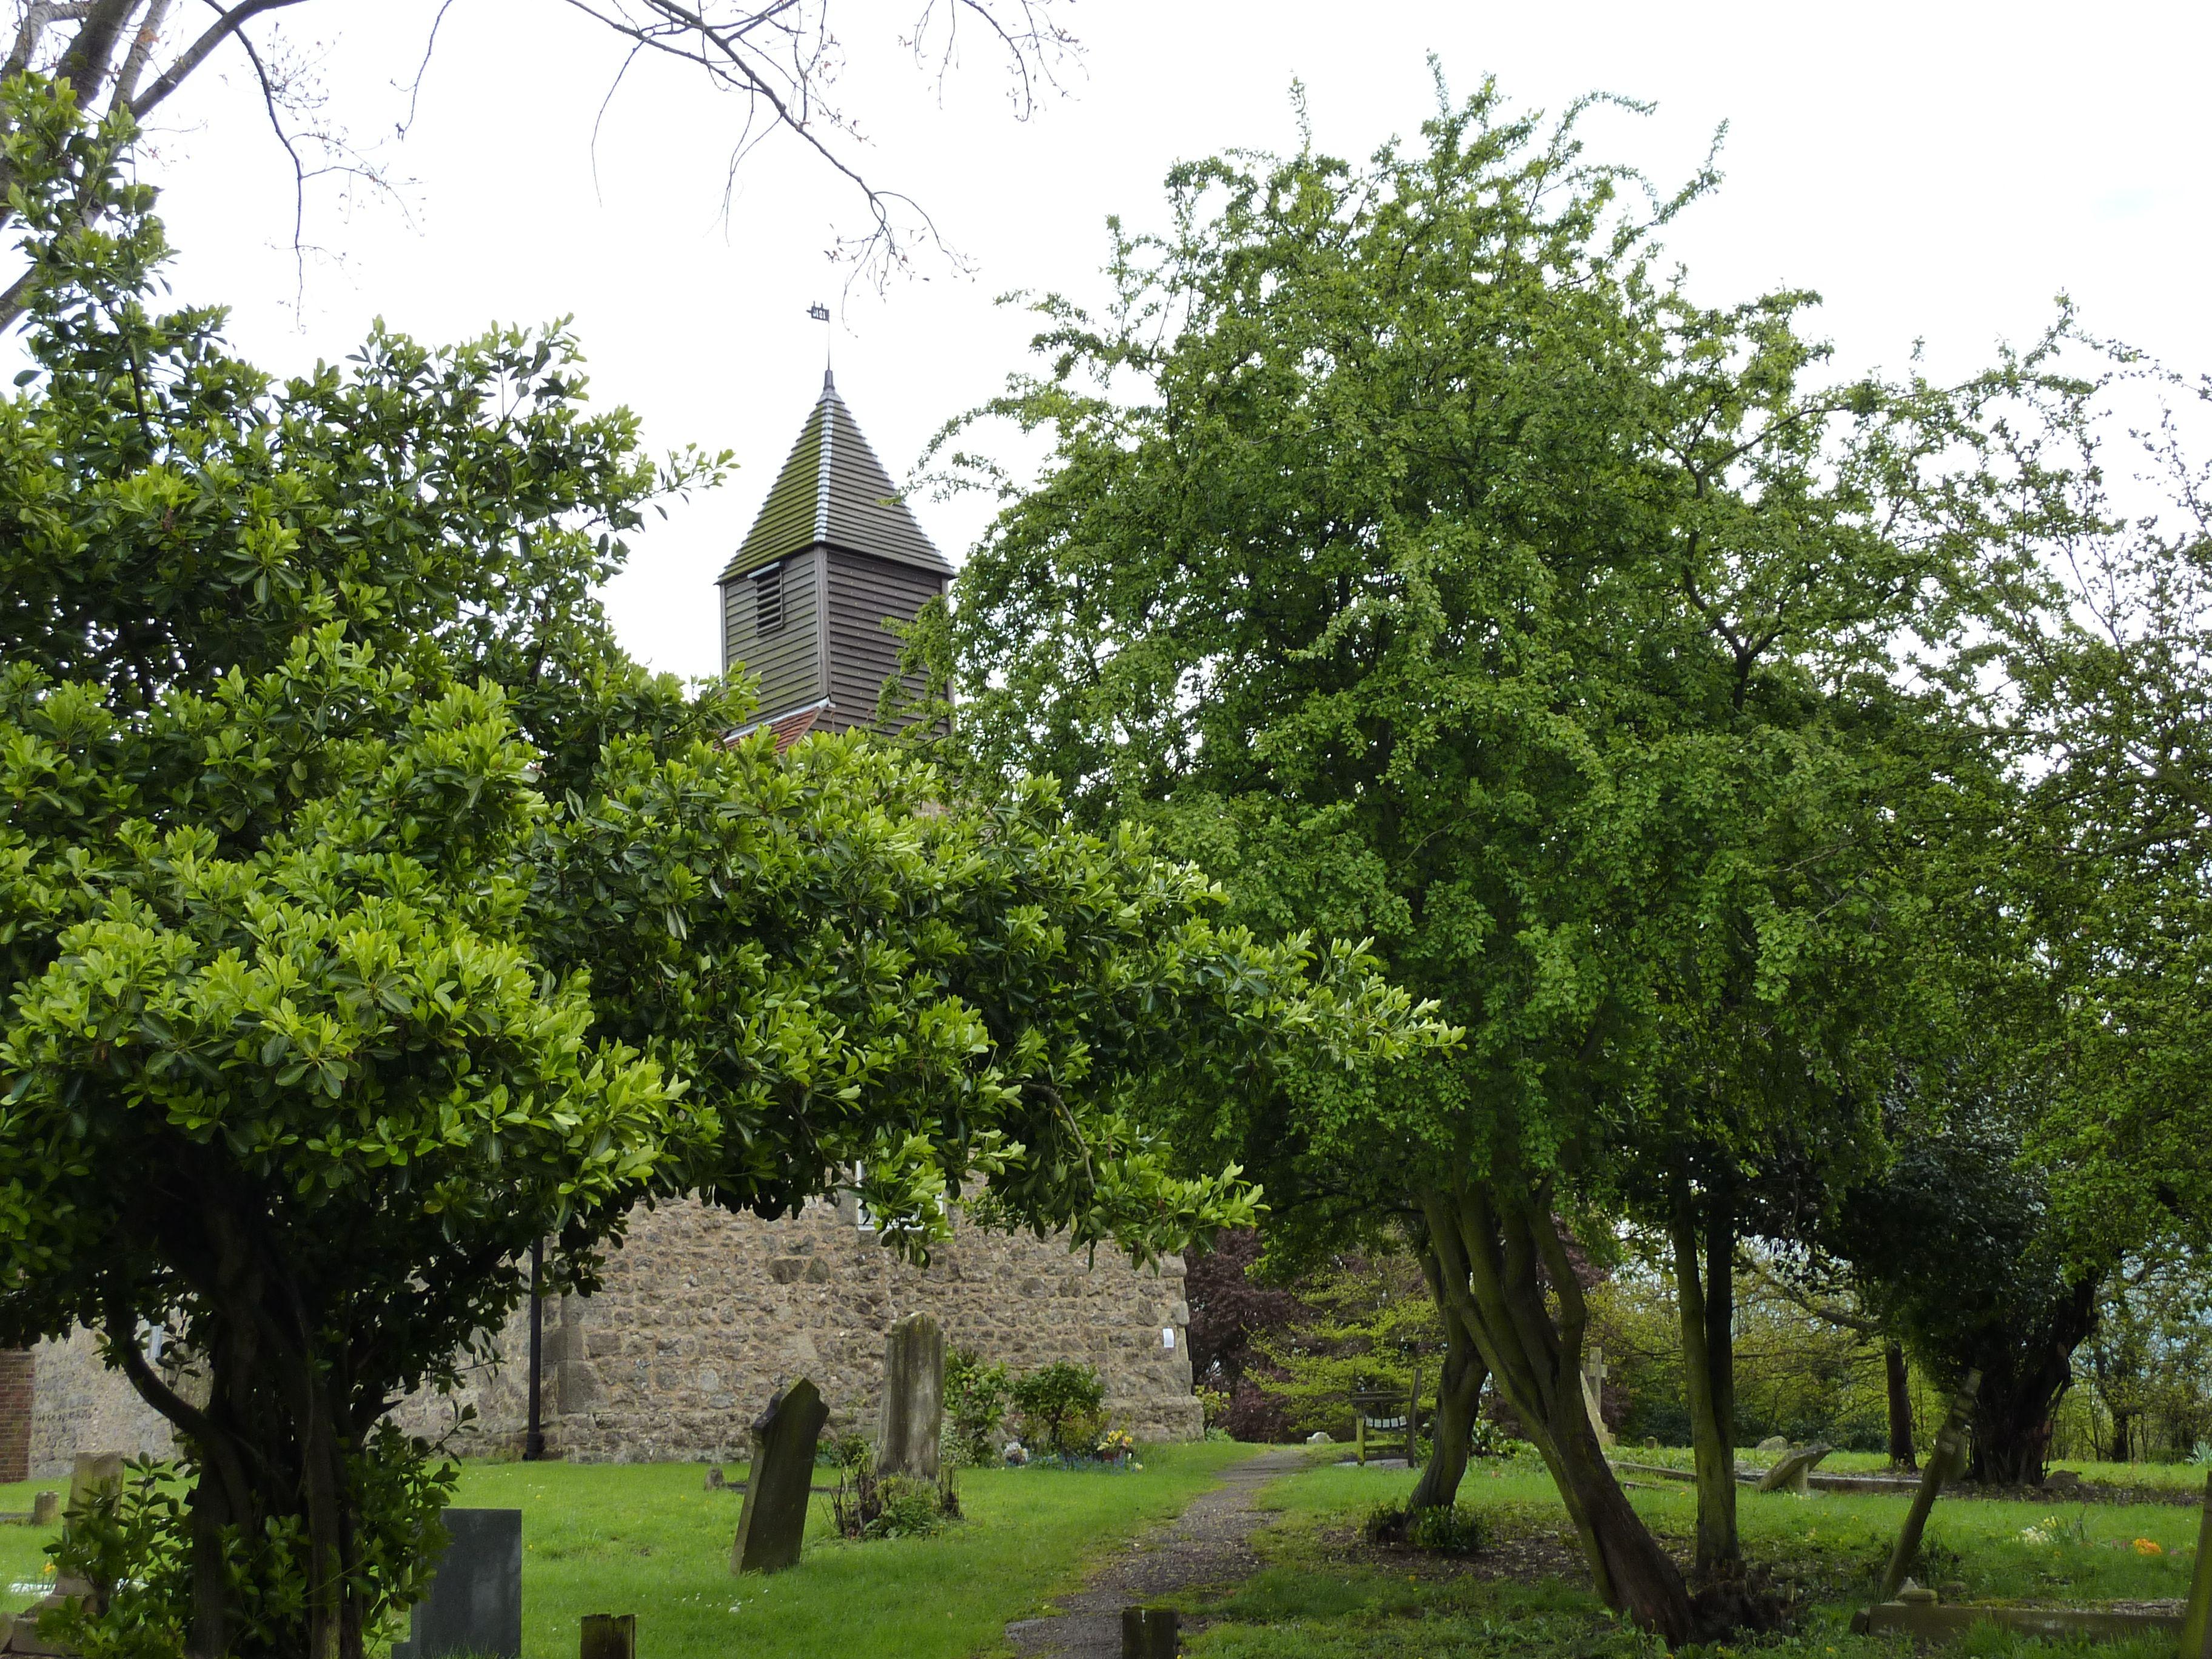 Looking through the trees, All Saints Church (Vange, Essex, England).  Taken: 12/02/2012.